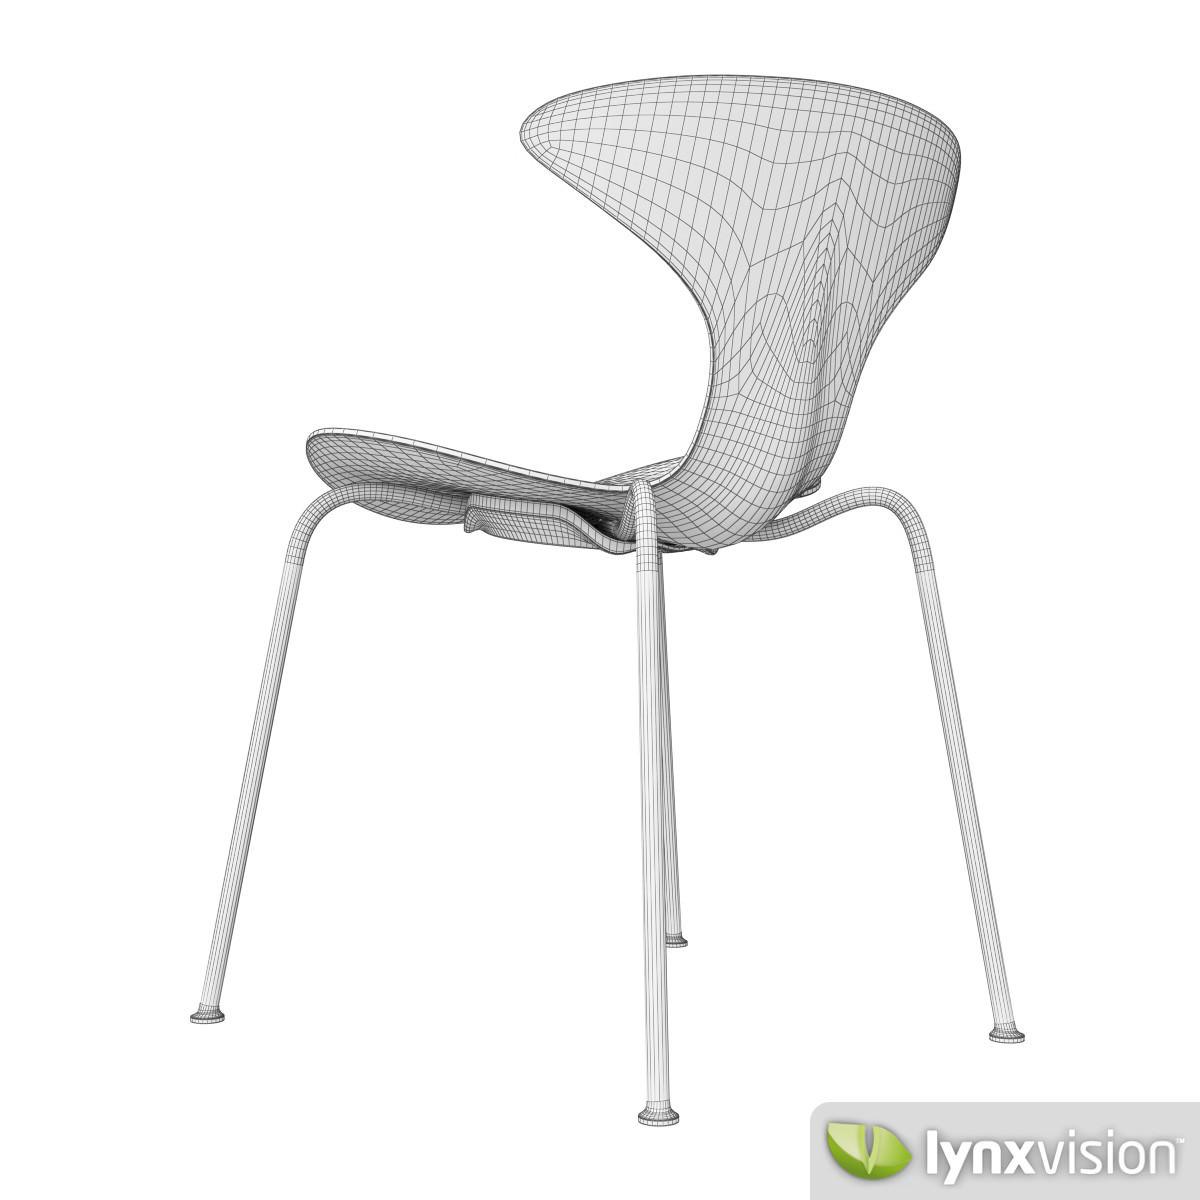 Orbit Chair by Ross Lovegrove 3D Model MAX OBJ FBX